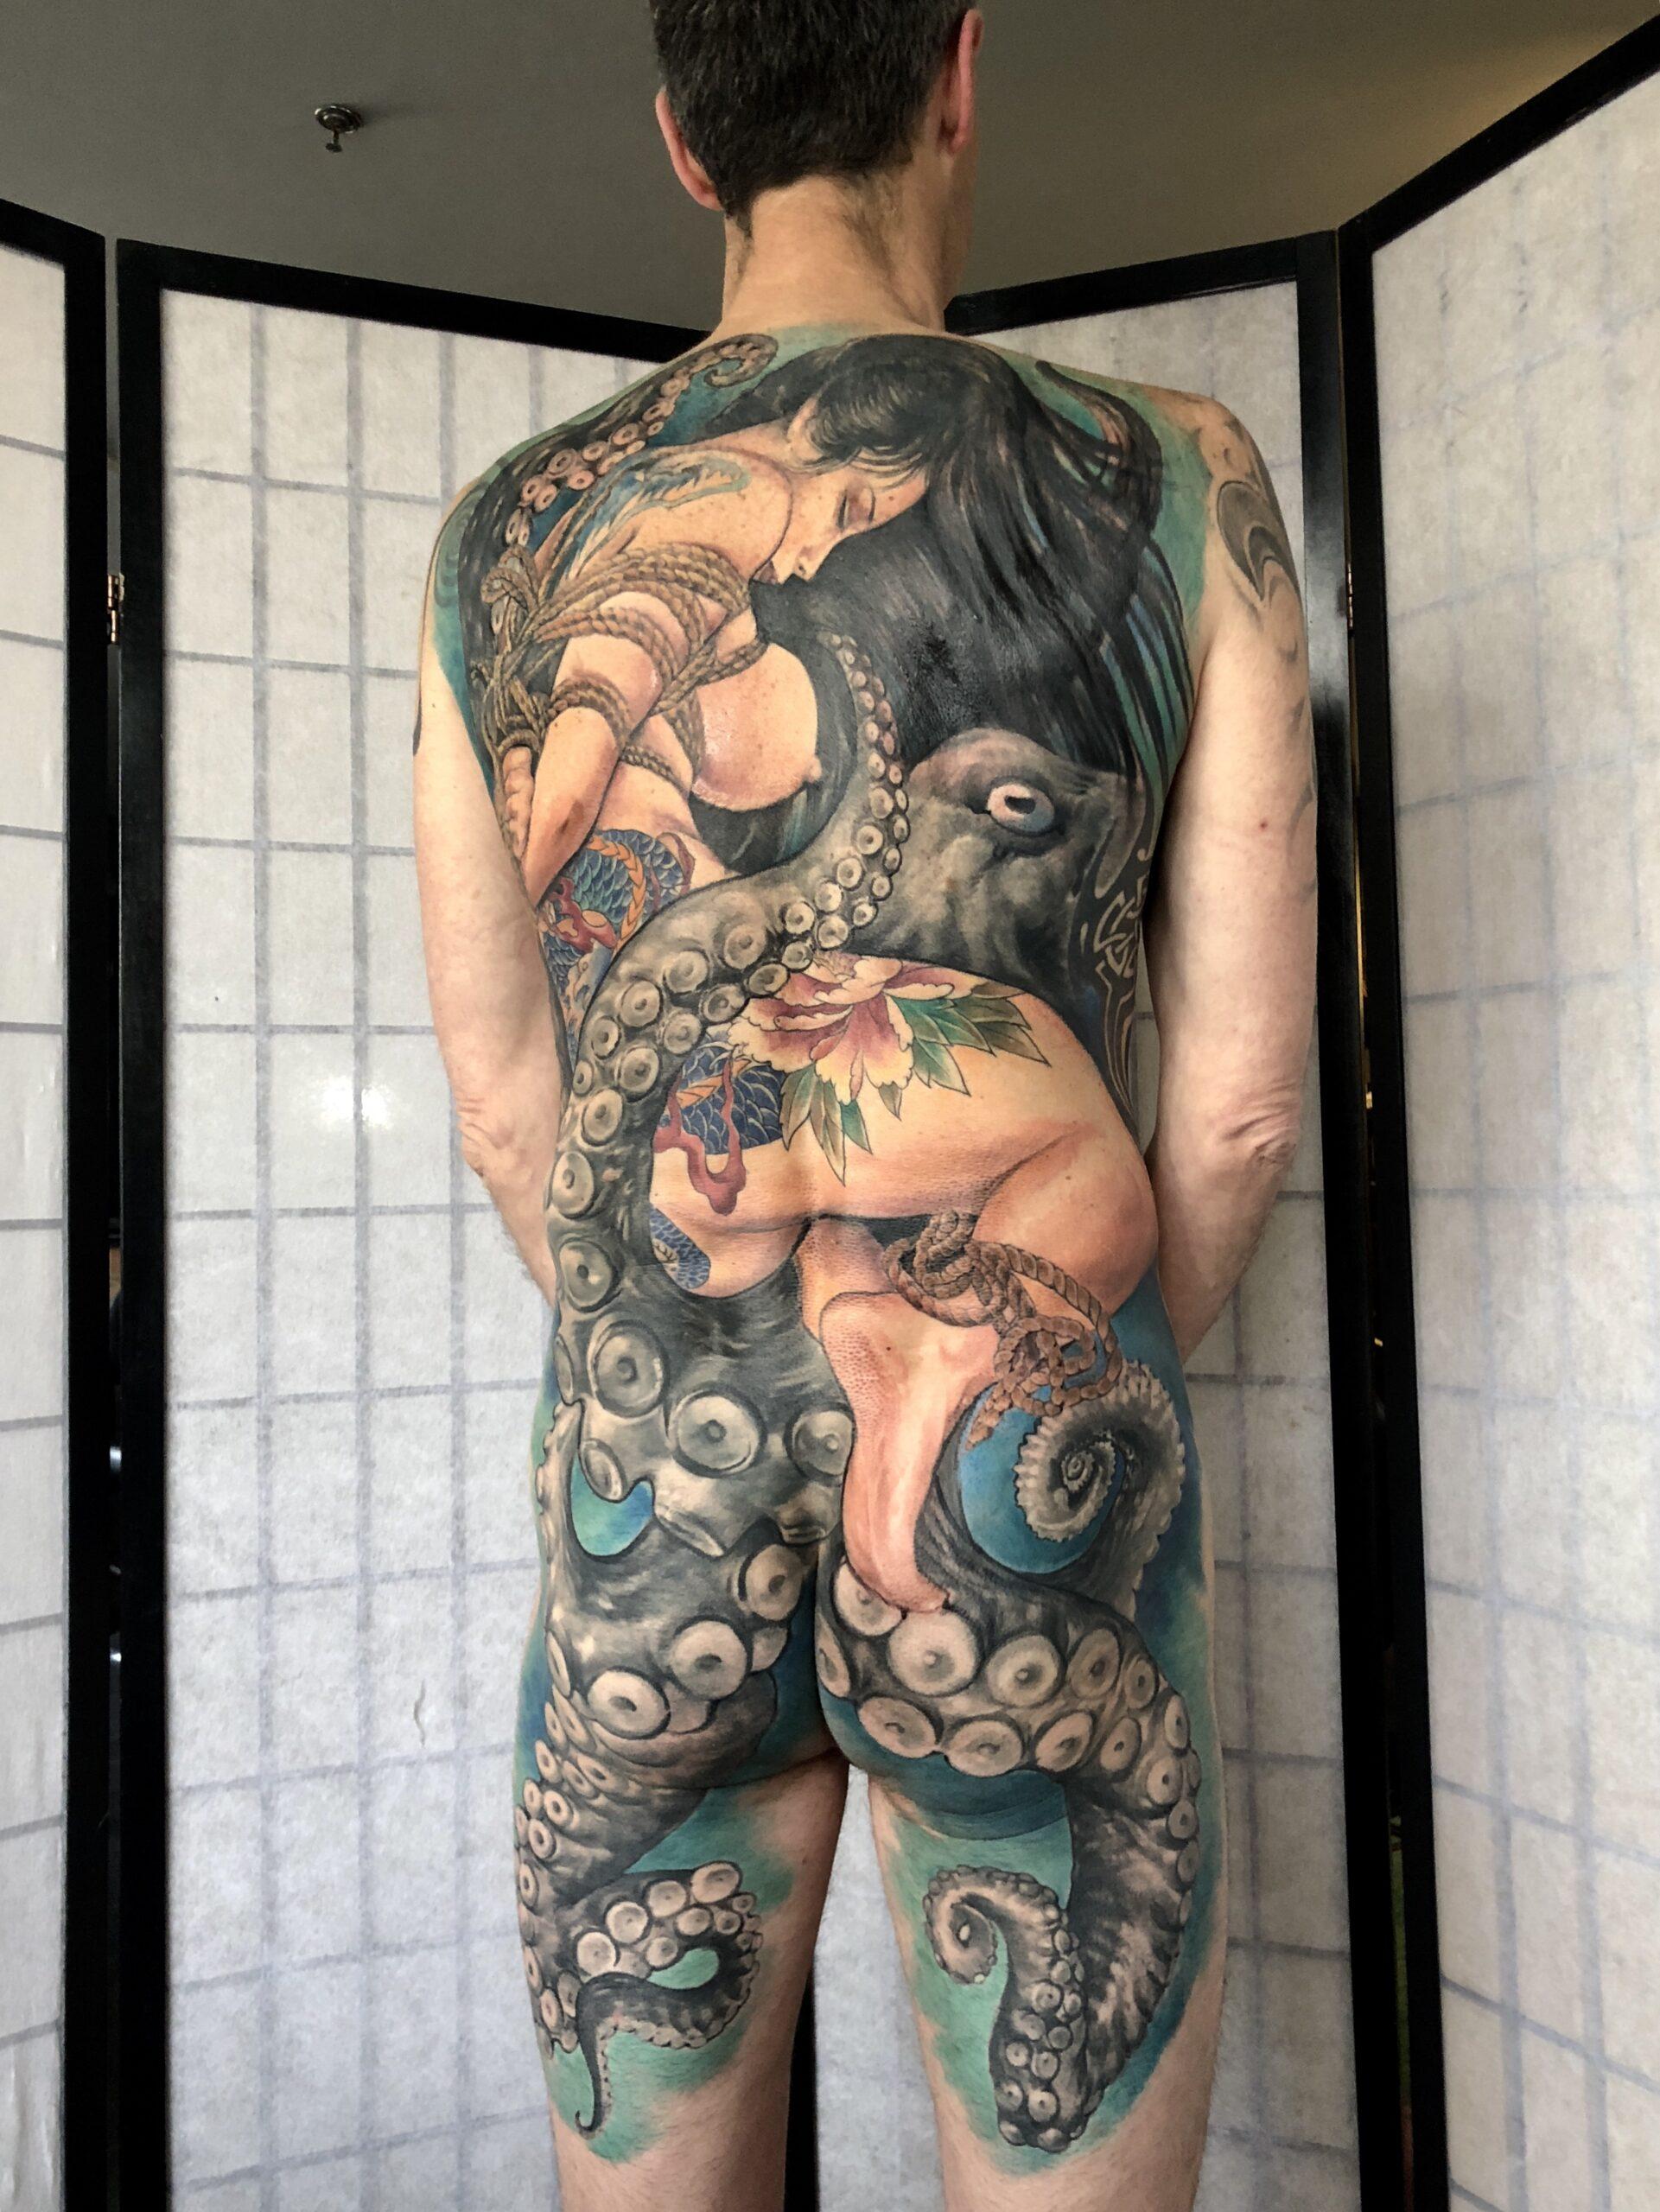 zhuo dan ting tattoo work 卓丹婷纹身作品 full back geisha tattoo 2